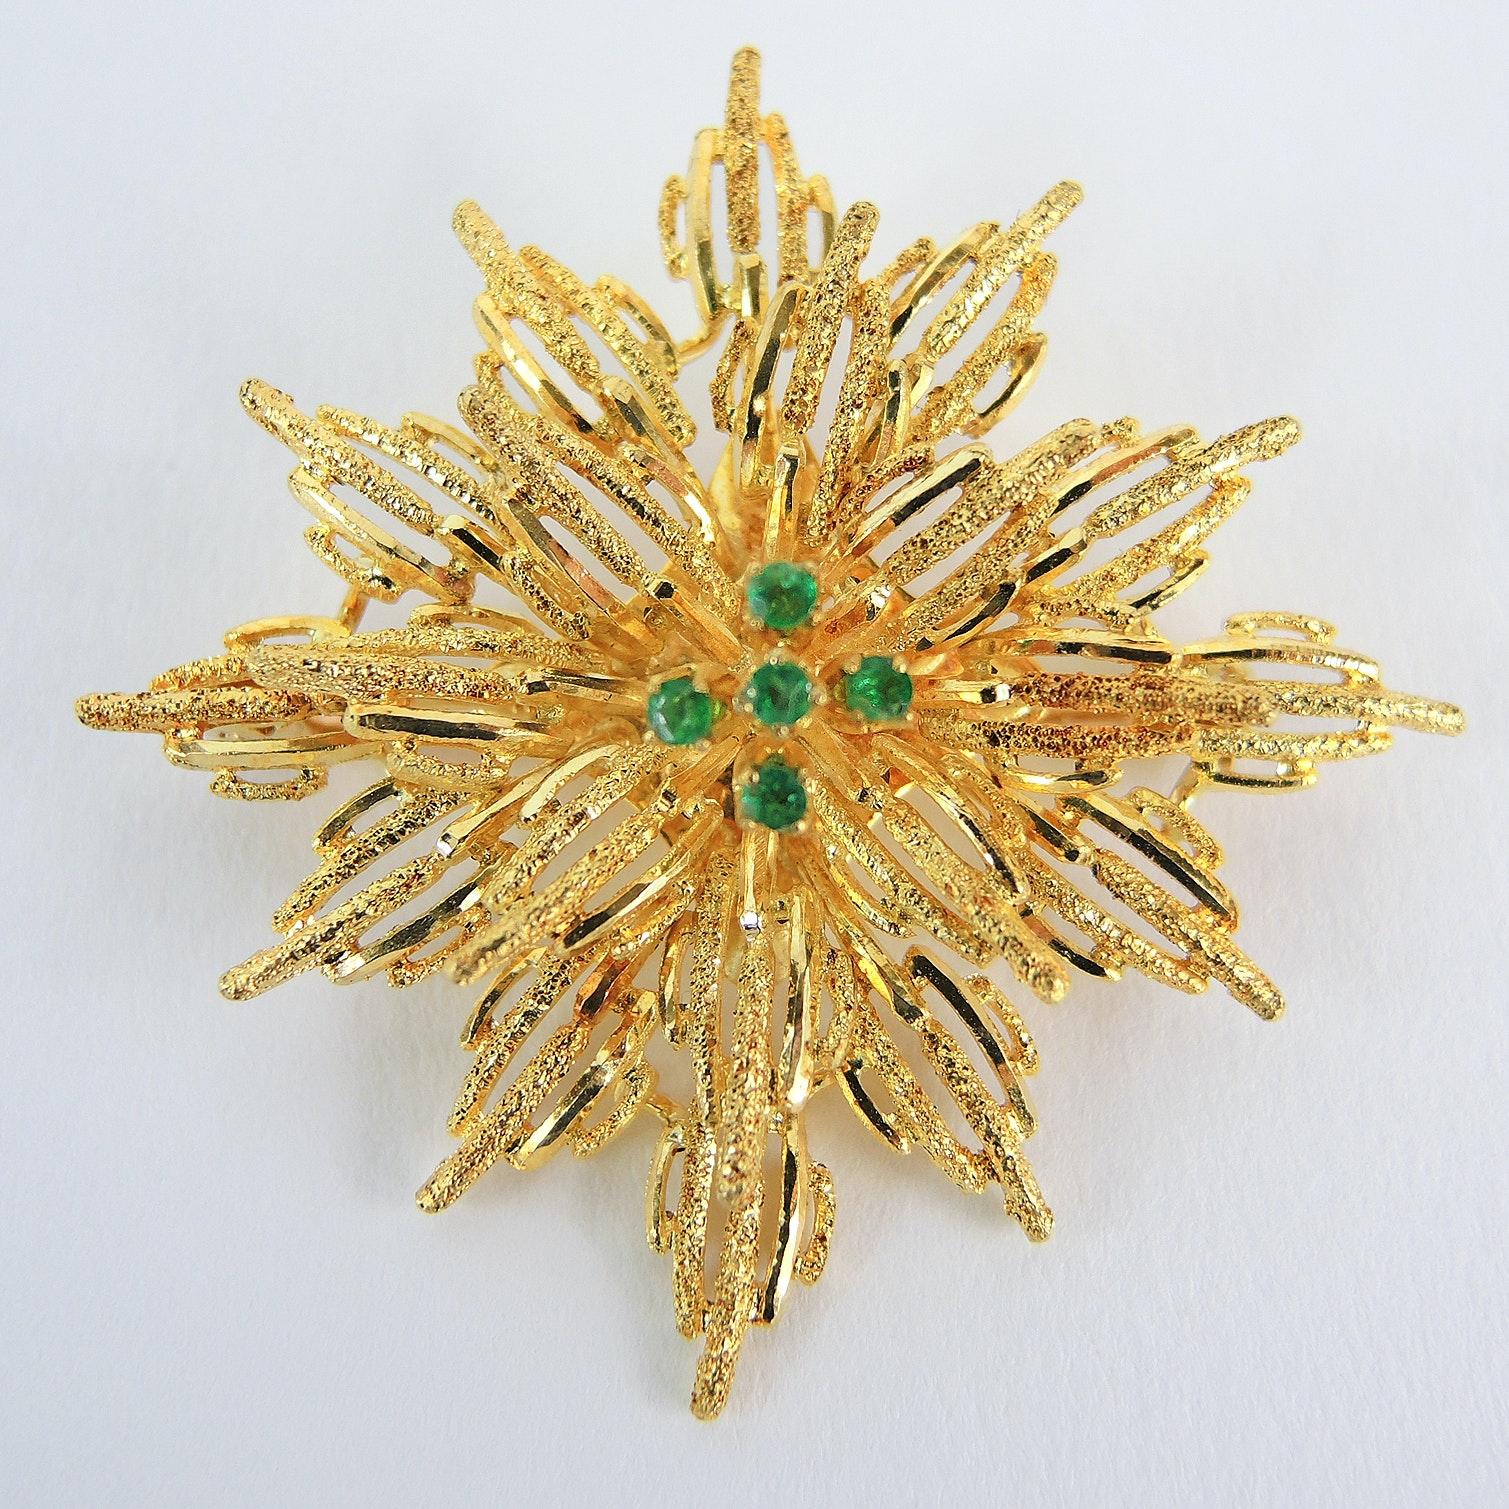 18K Yellow Gold Emerald Brooch